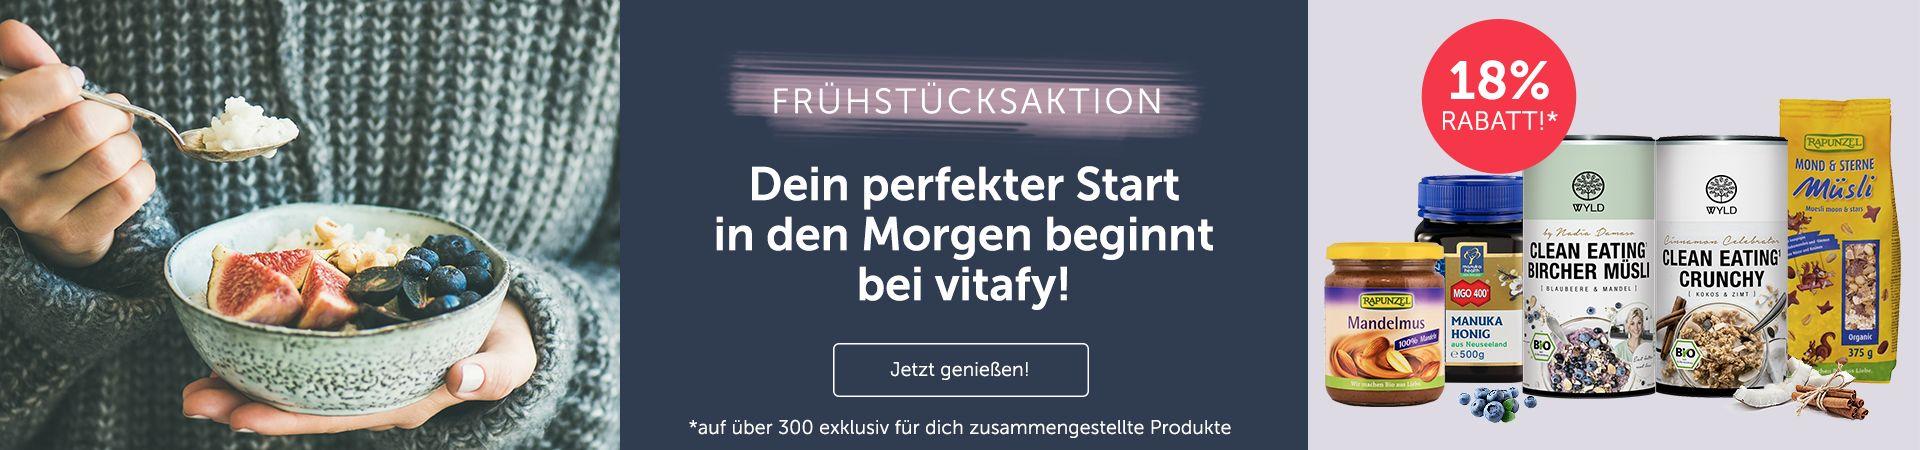 20181206_Fruehstuecksaktion_18proz